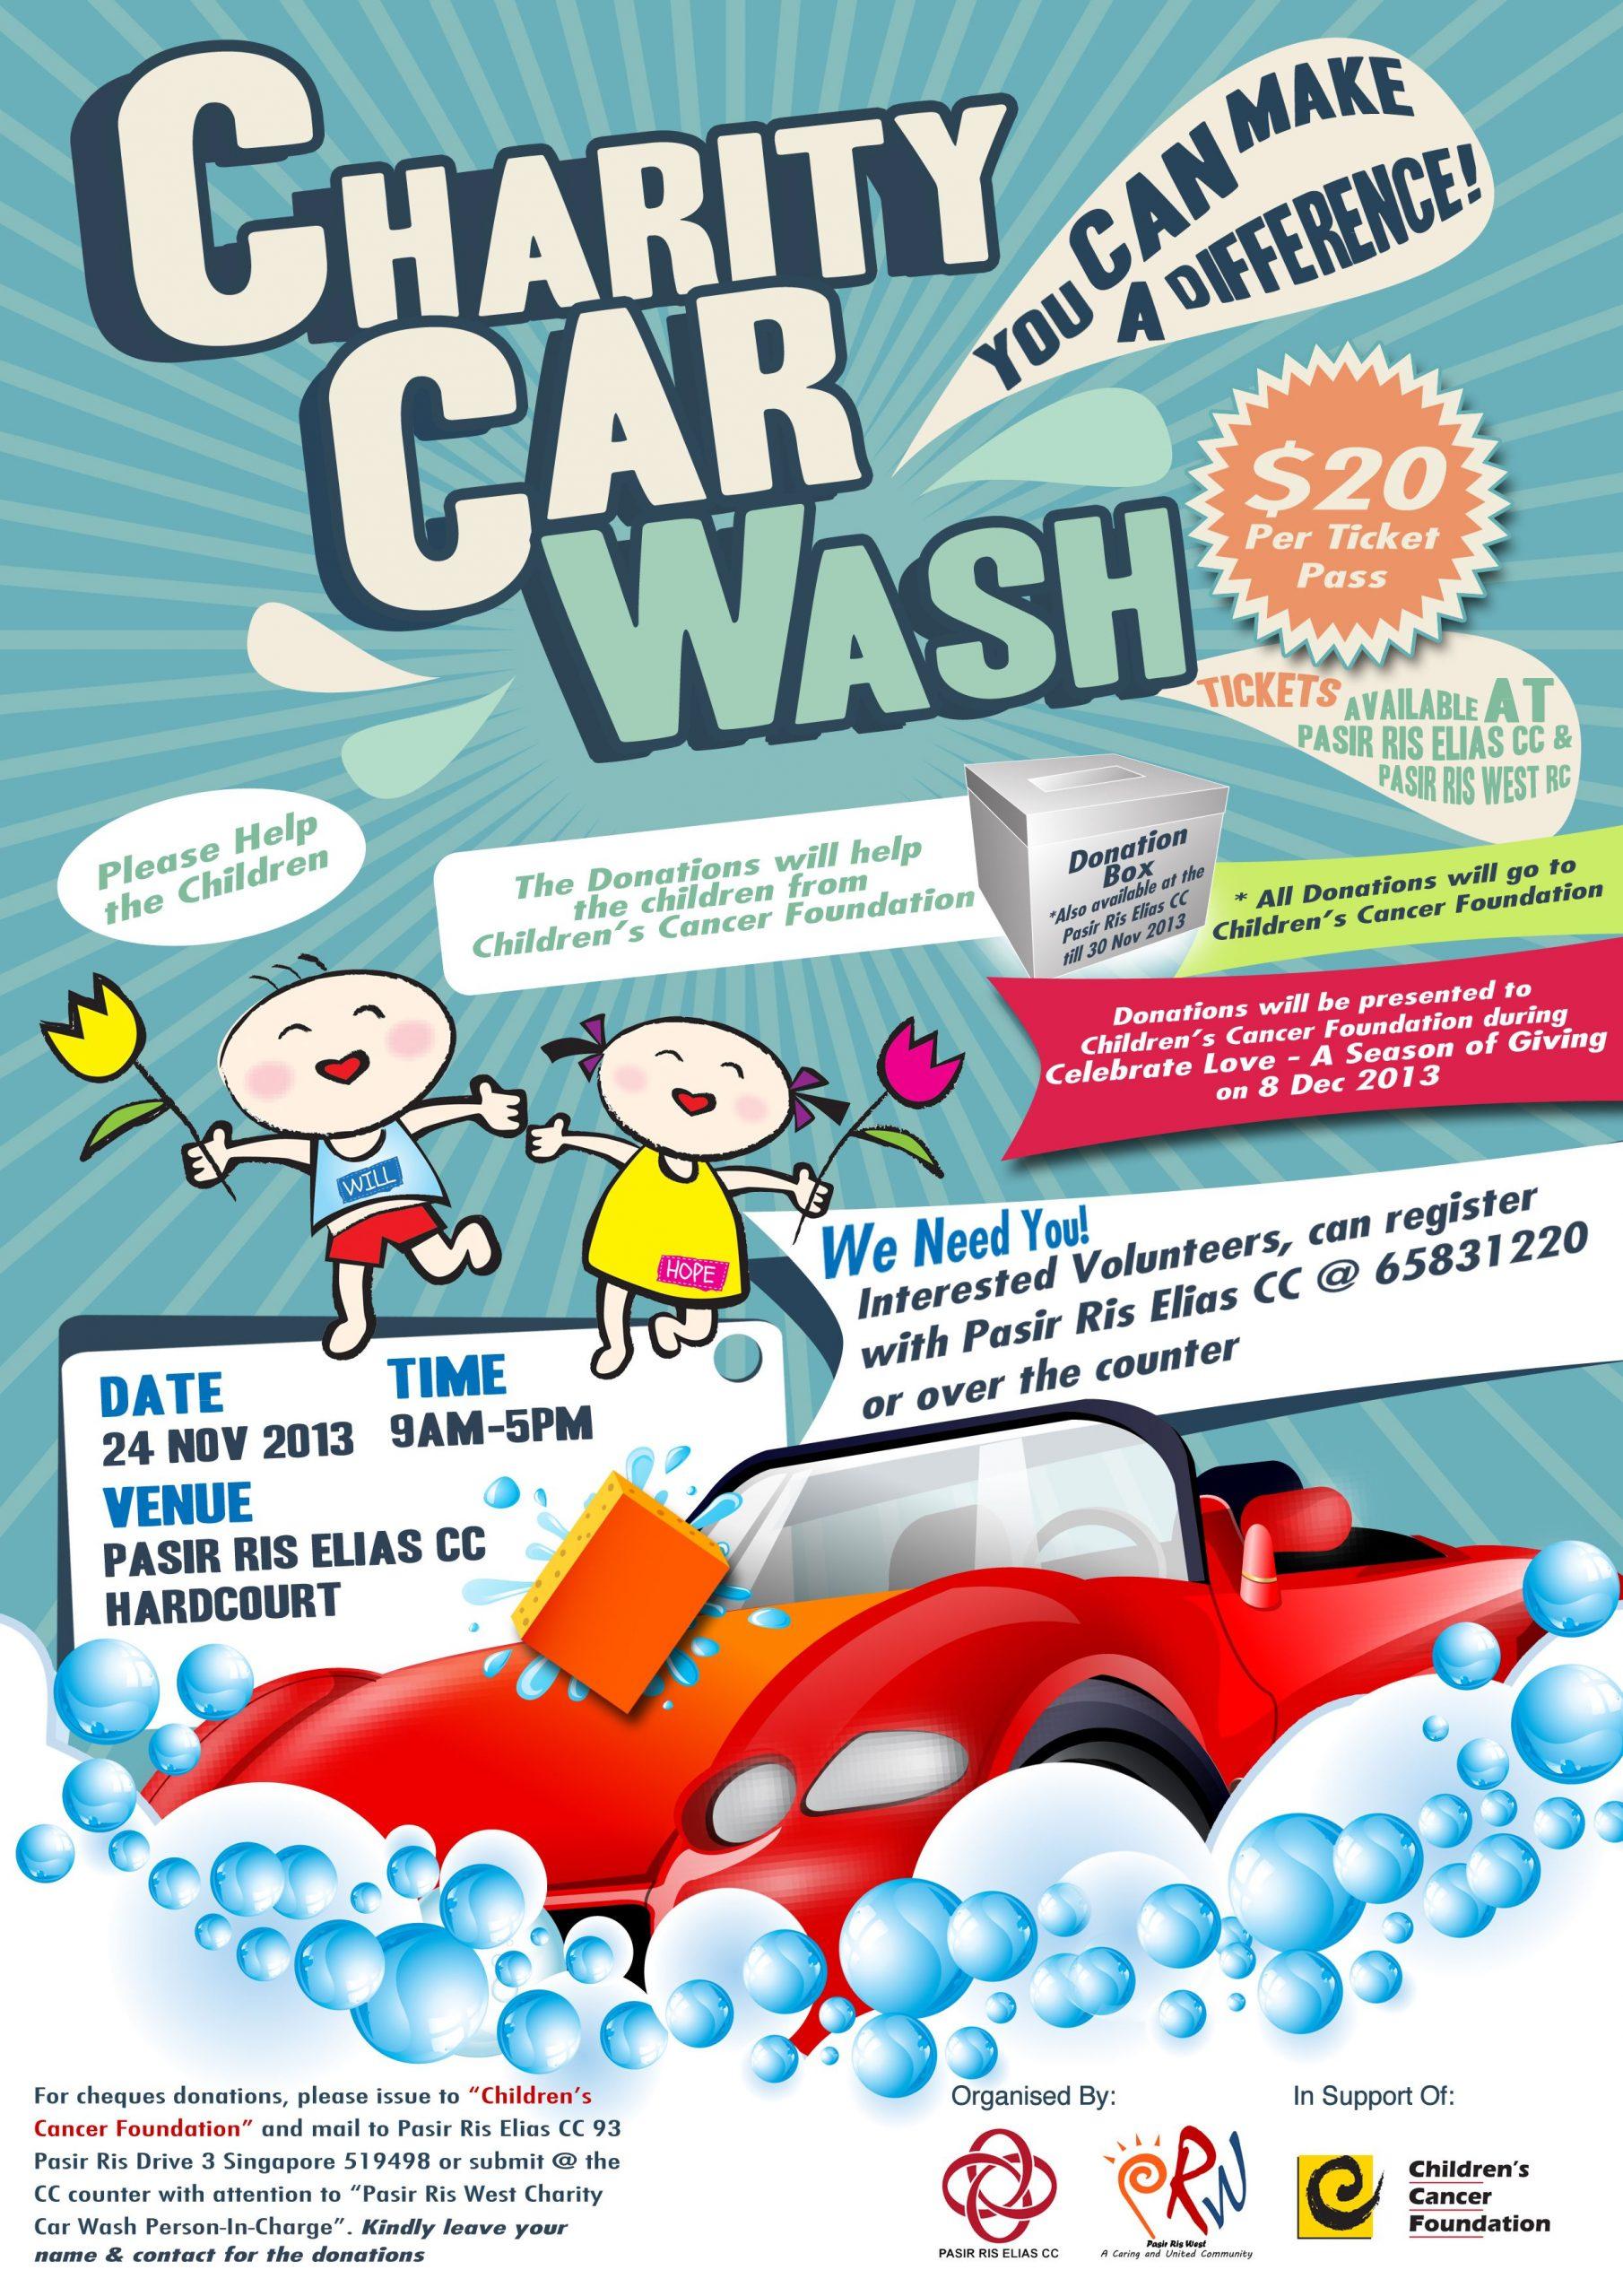 charity car wash poster template, car wash fundraiser flyer template free, car wash flyer template word, car wash flyer template psd